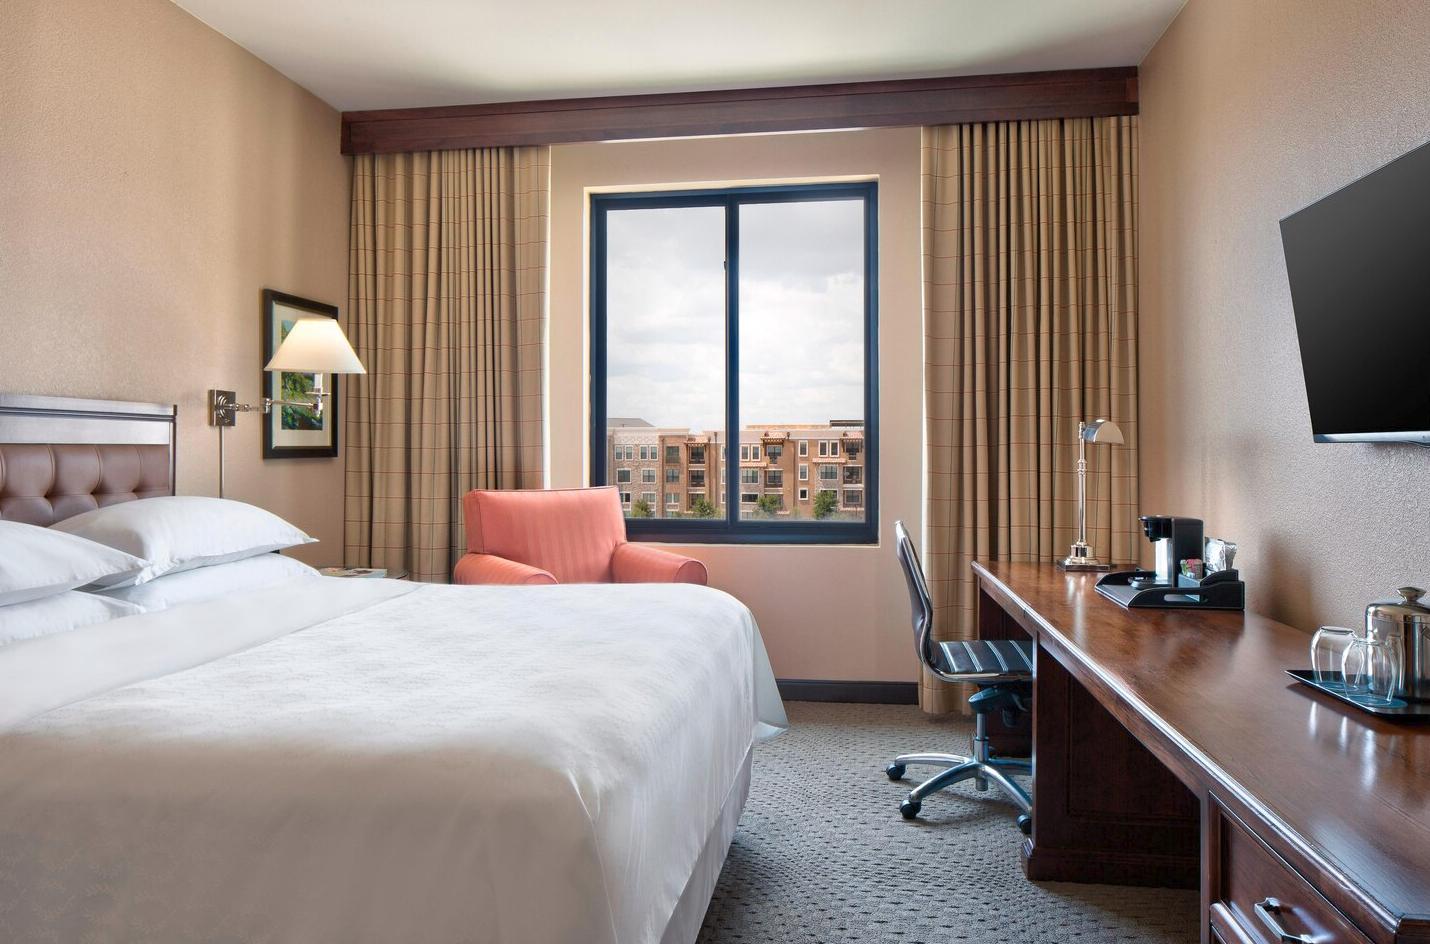 https://www.hotelsbyday.com/_data/default-hotel_image/3/16441/screenshot-2020-04-07-at-4-16-51-pm.png